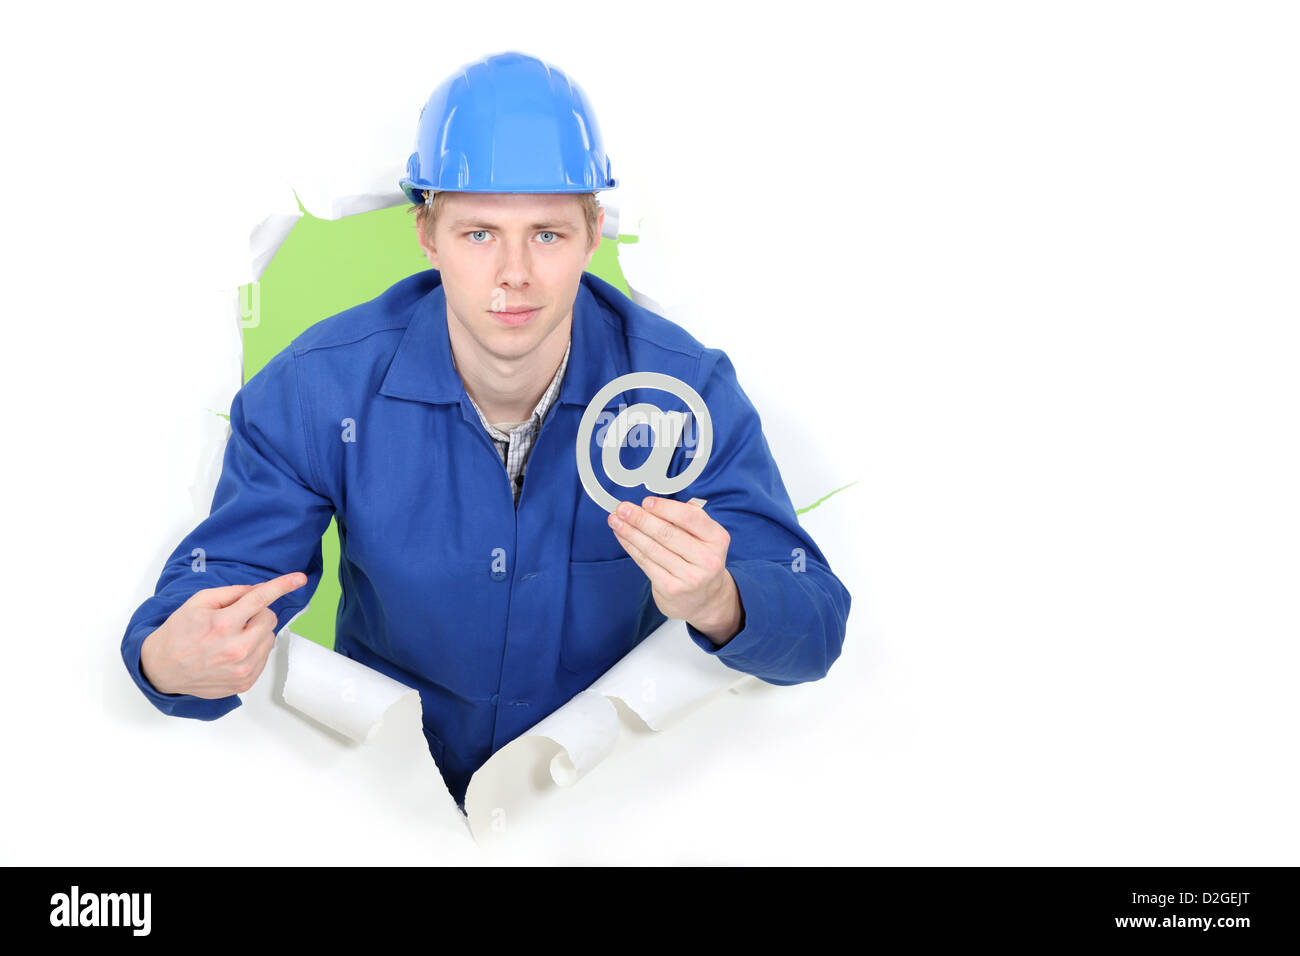 Builder promoting e-mail address - Stock Image